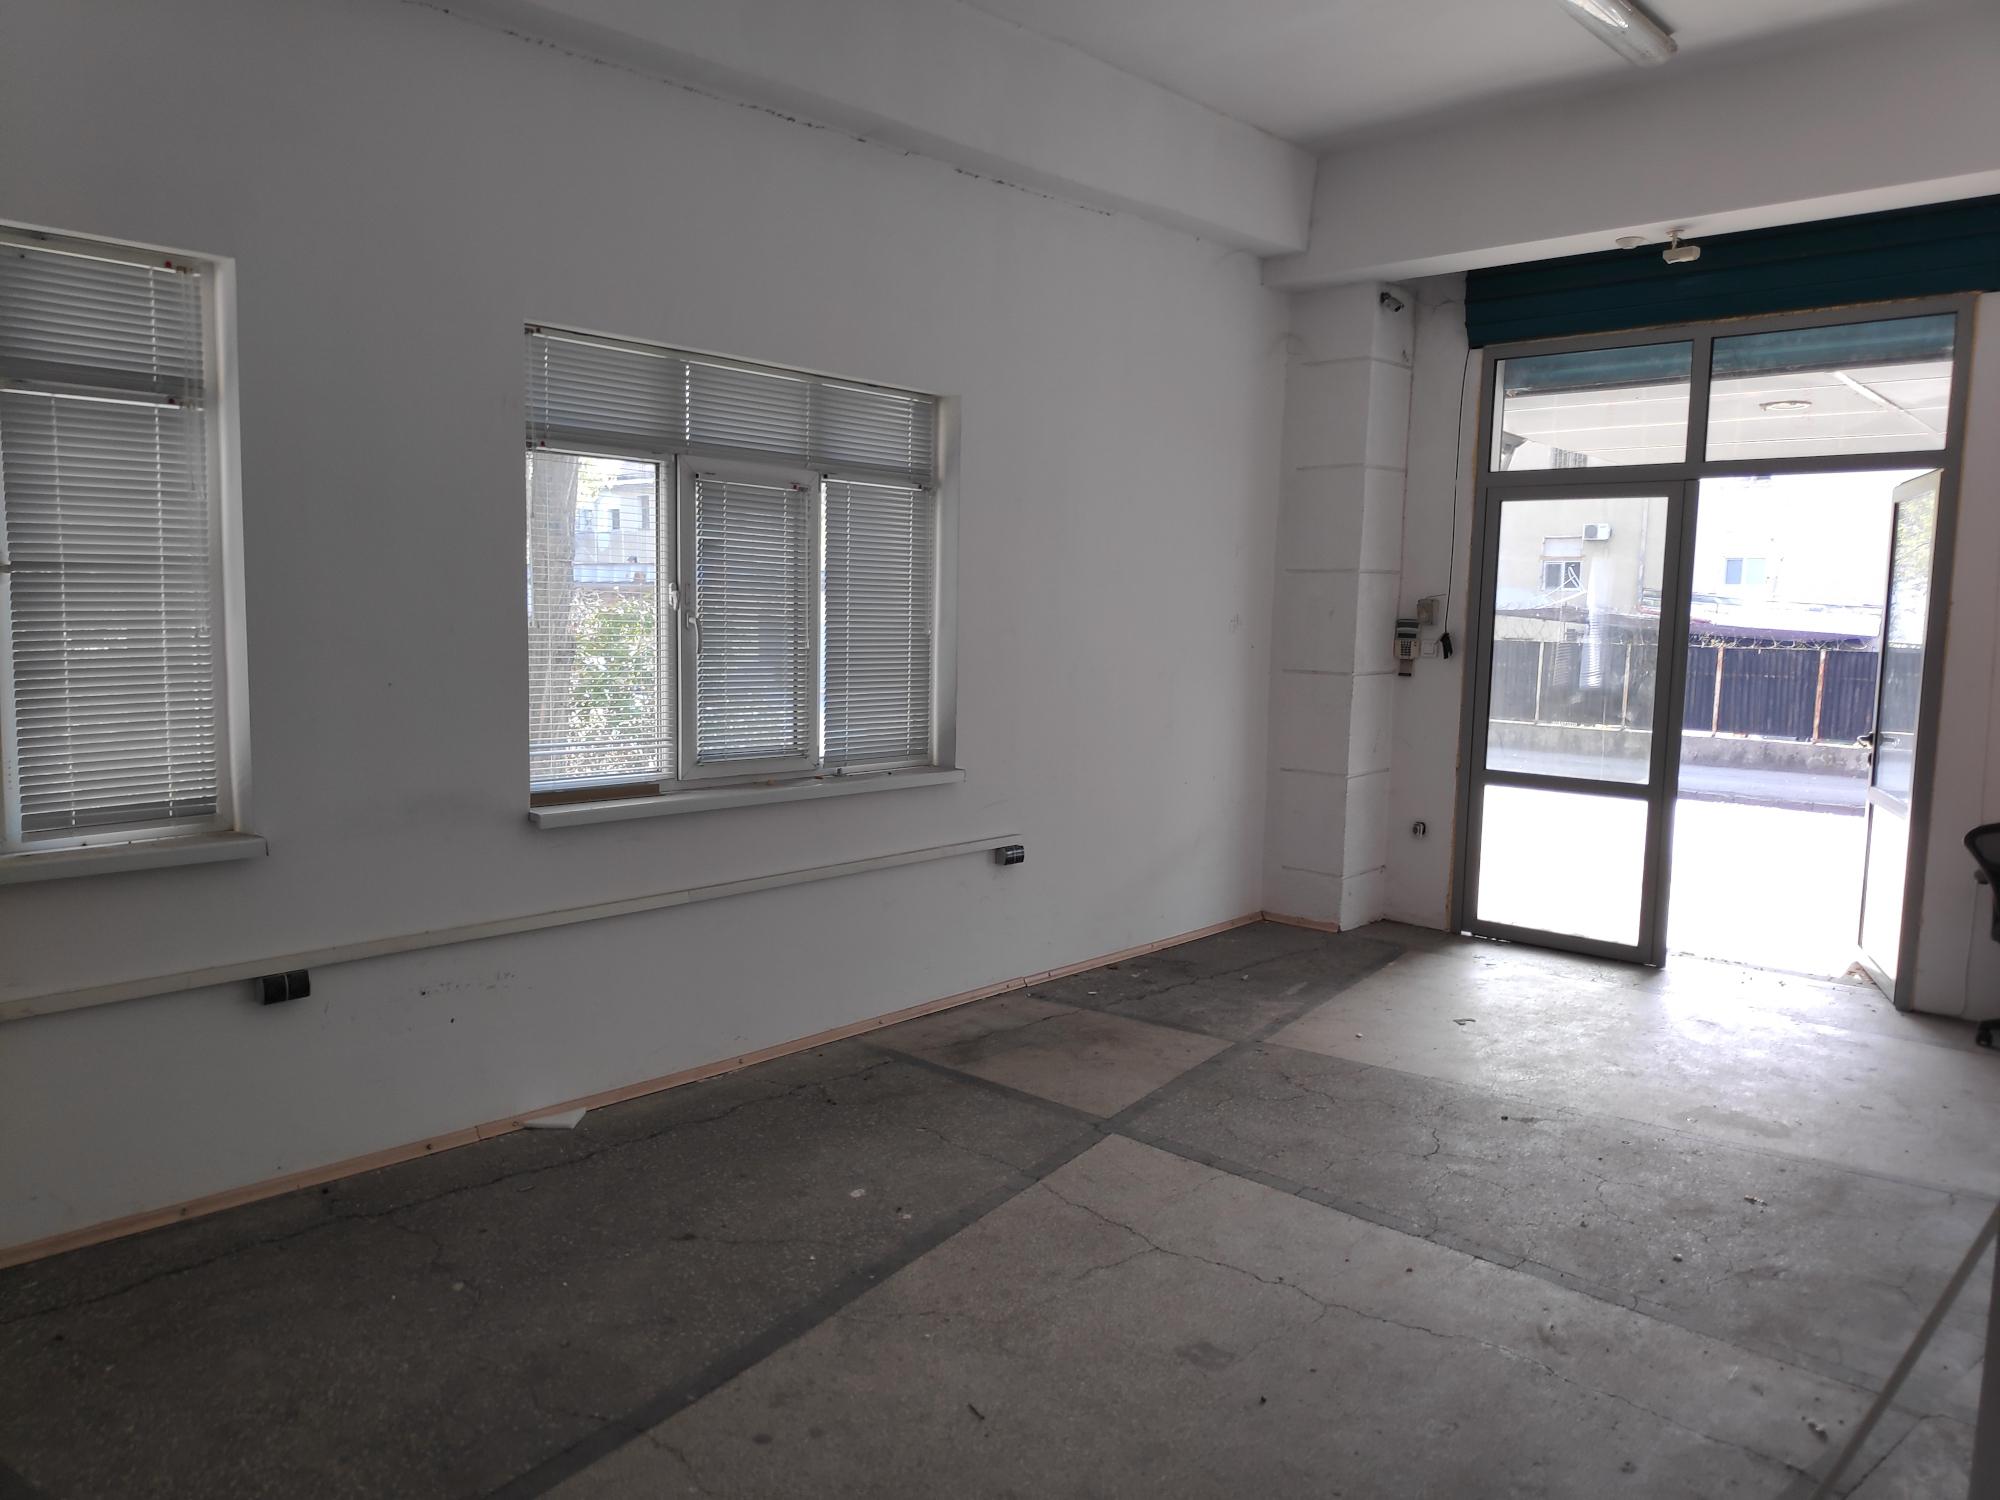 Офис/магазин - приемна с 5 помещения + склад